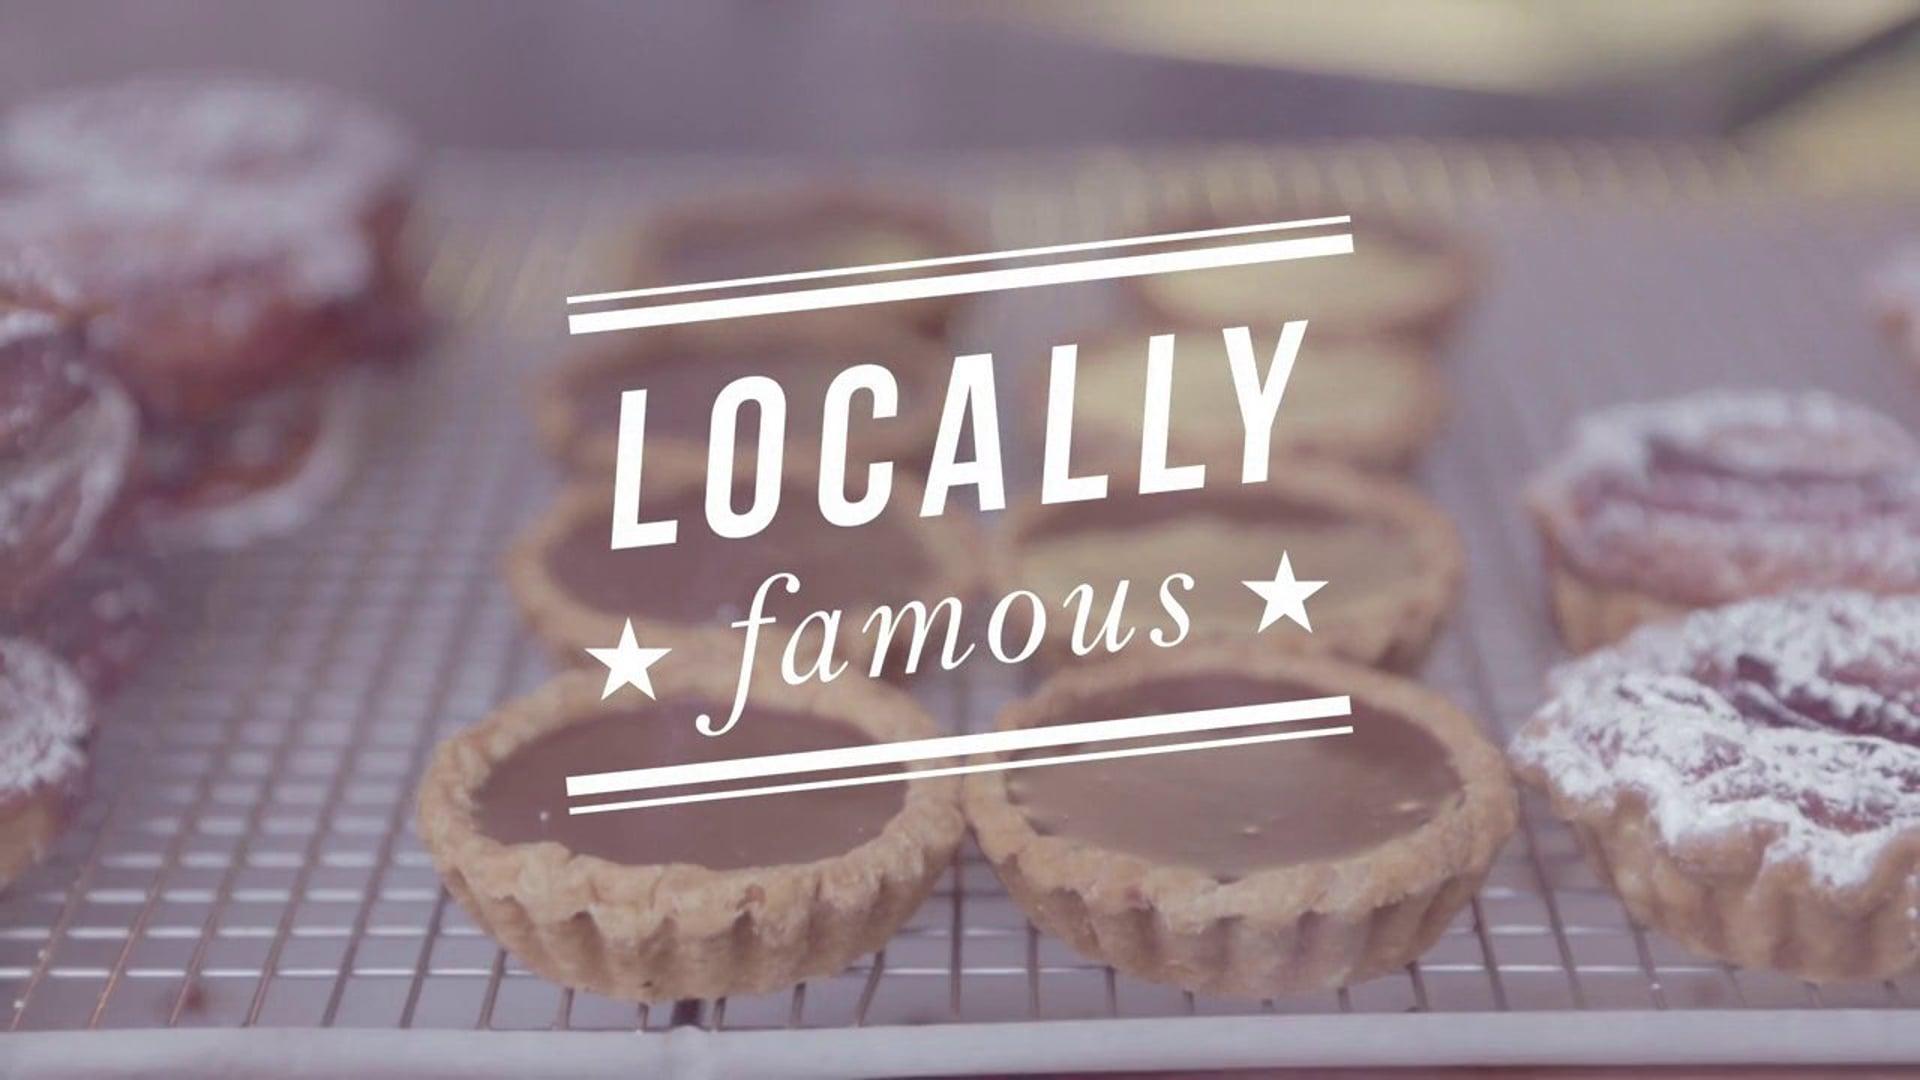 Mastercard - Locally Famous: Bourke Street Bakery